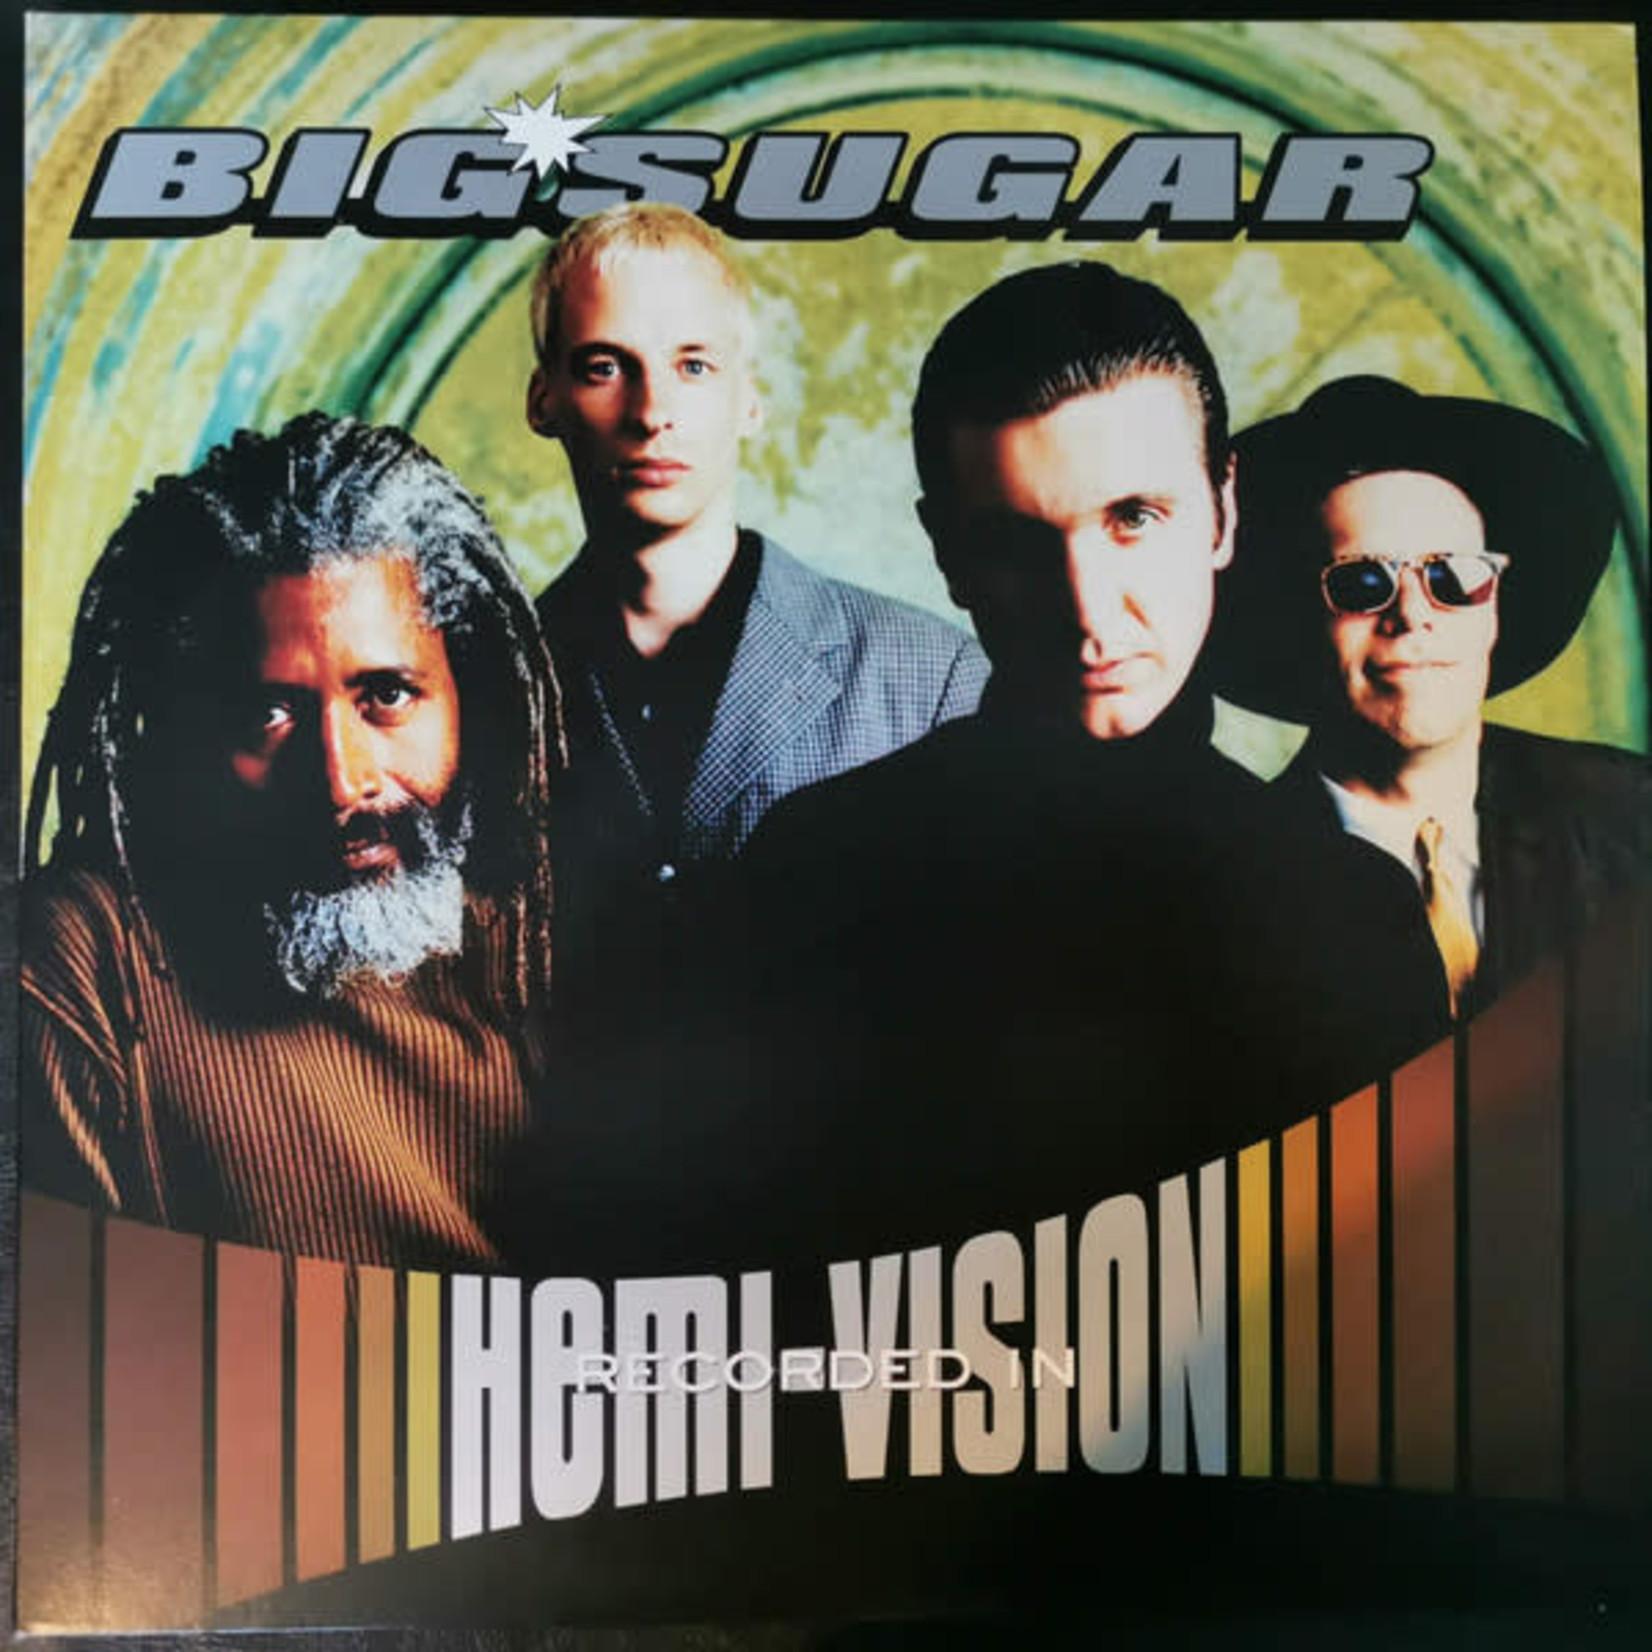 BIG SUGAR HEMI-VISION DLX ORANGE & GREEN VINYL 2LP)